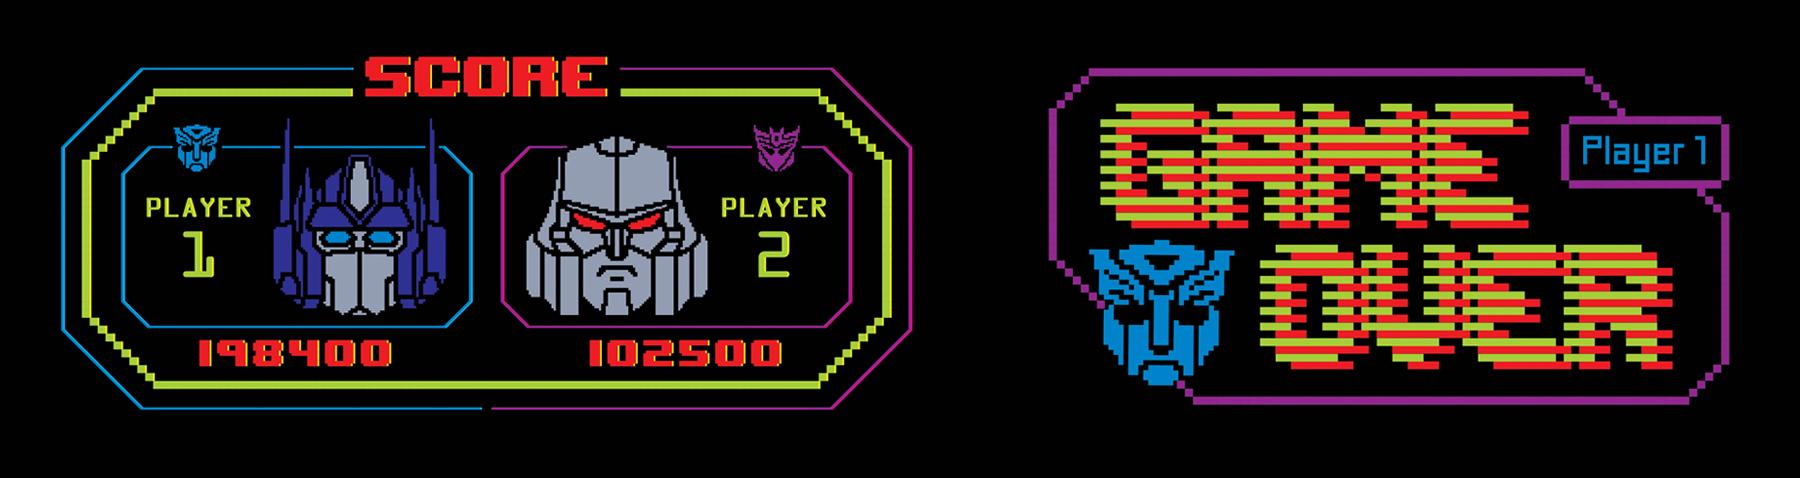 TF Gen 1: 1984 Arcade Style Guide Design - ID 5